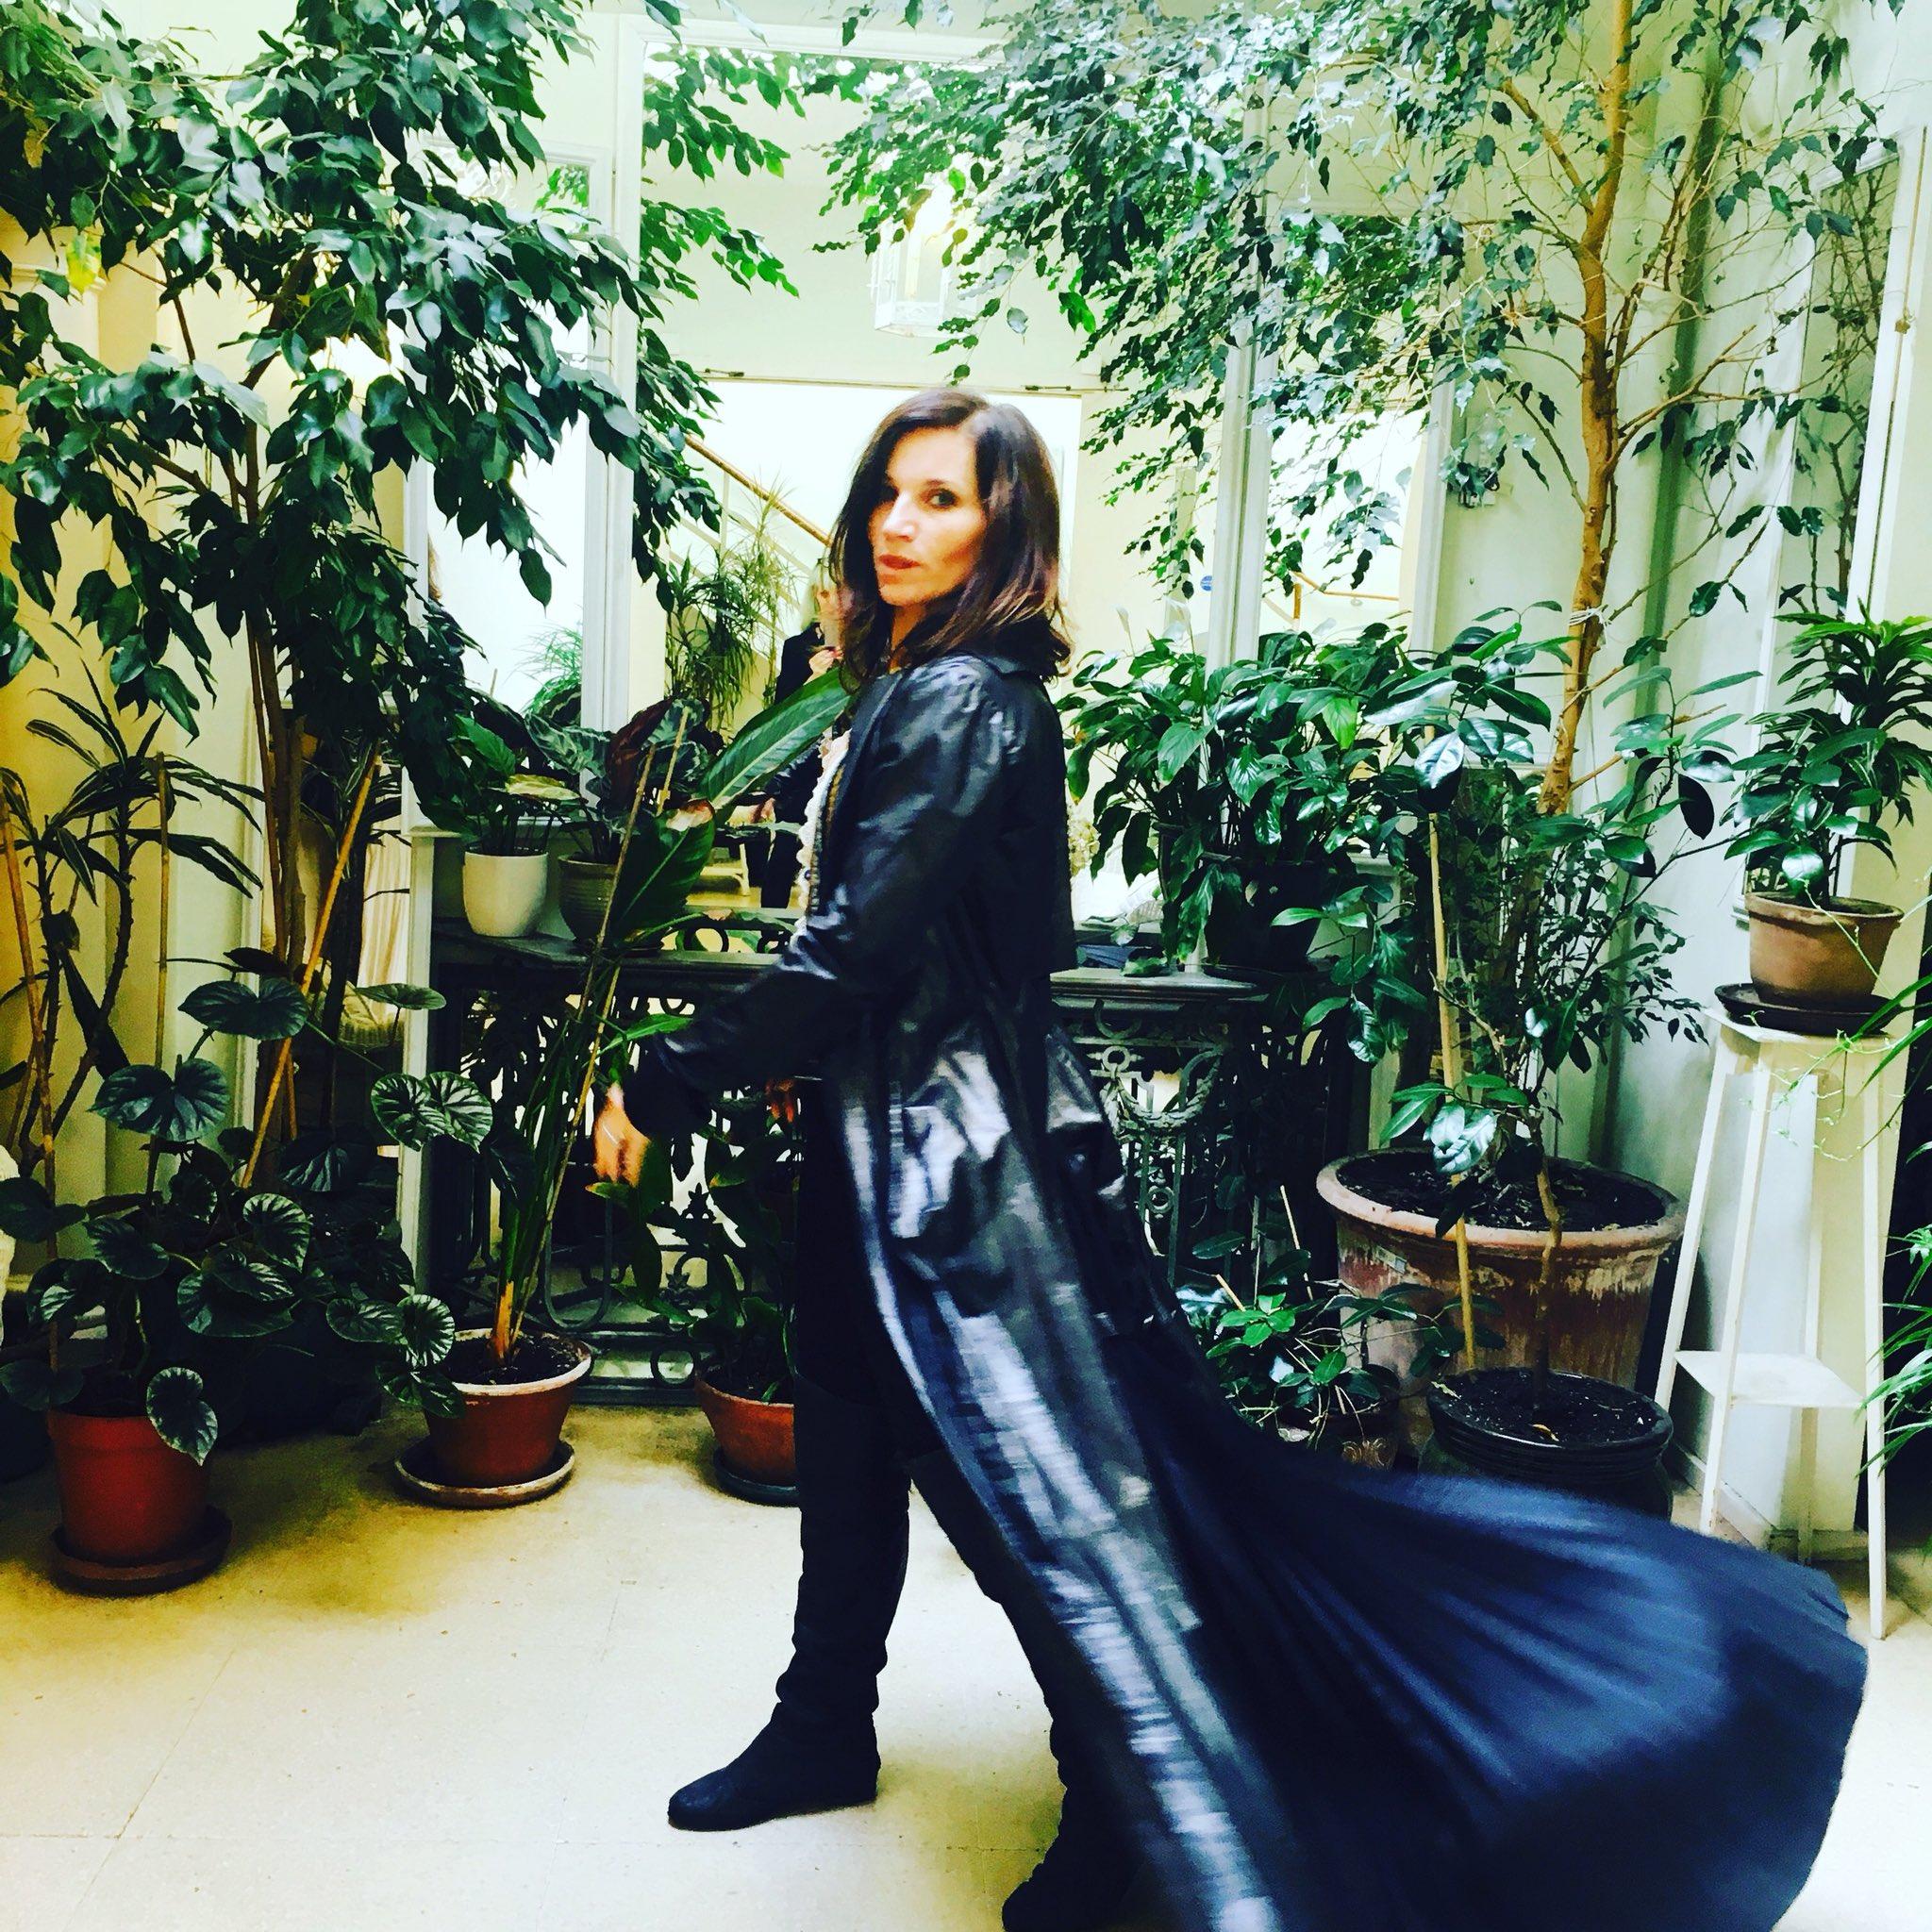 Kate Fleetwood On Twitter Hulu Harlotsonhulu Nancybirch New Dream Coat For Season 2 Kate fleetwood's films include macbeth, harlots, london road, the death of pentheus. kate fleetwood on twitter hulu